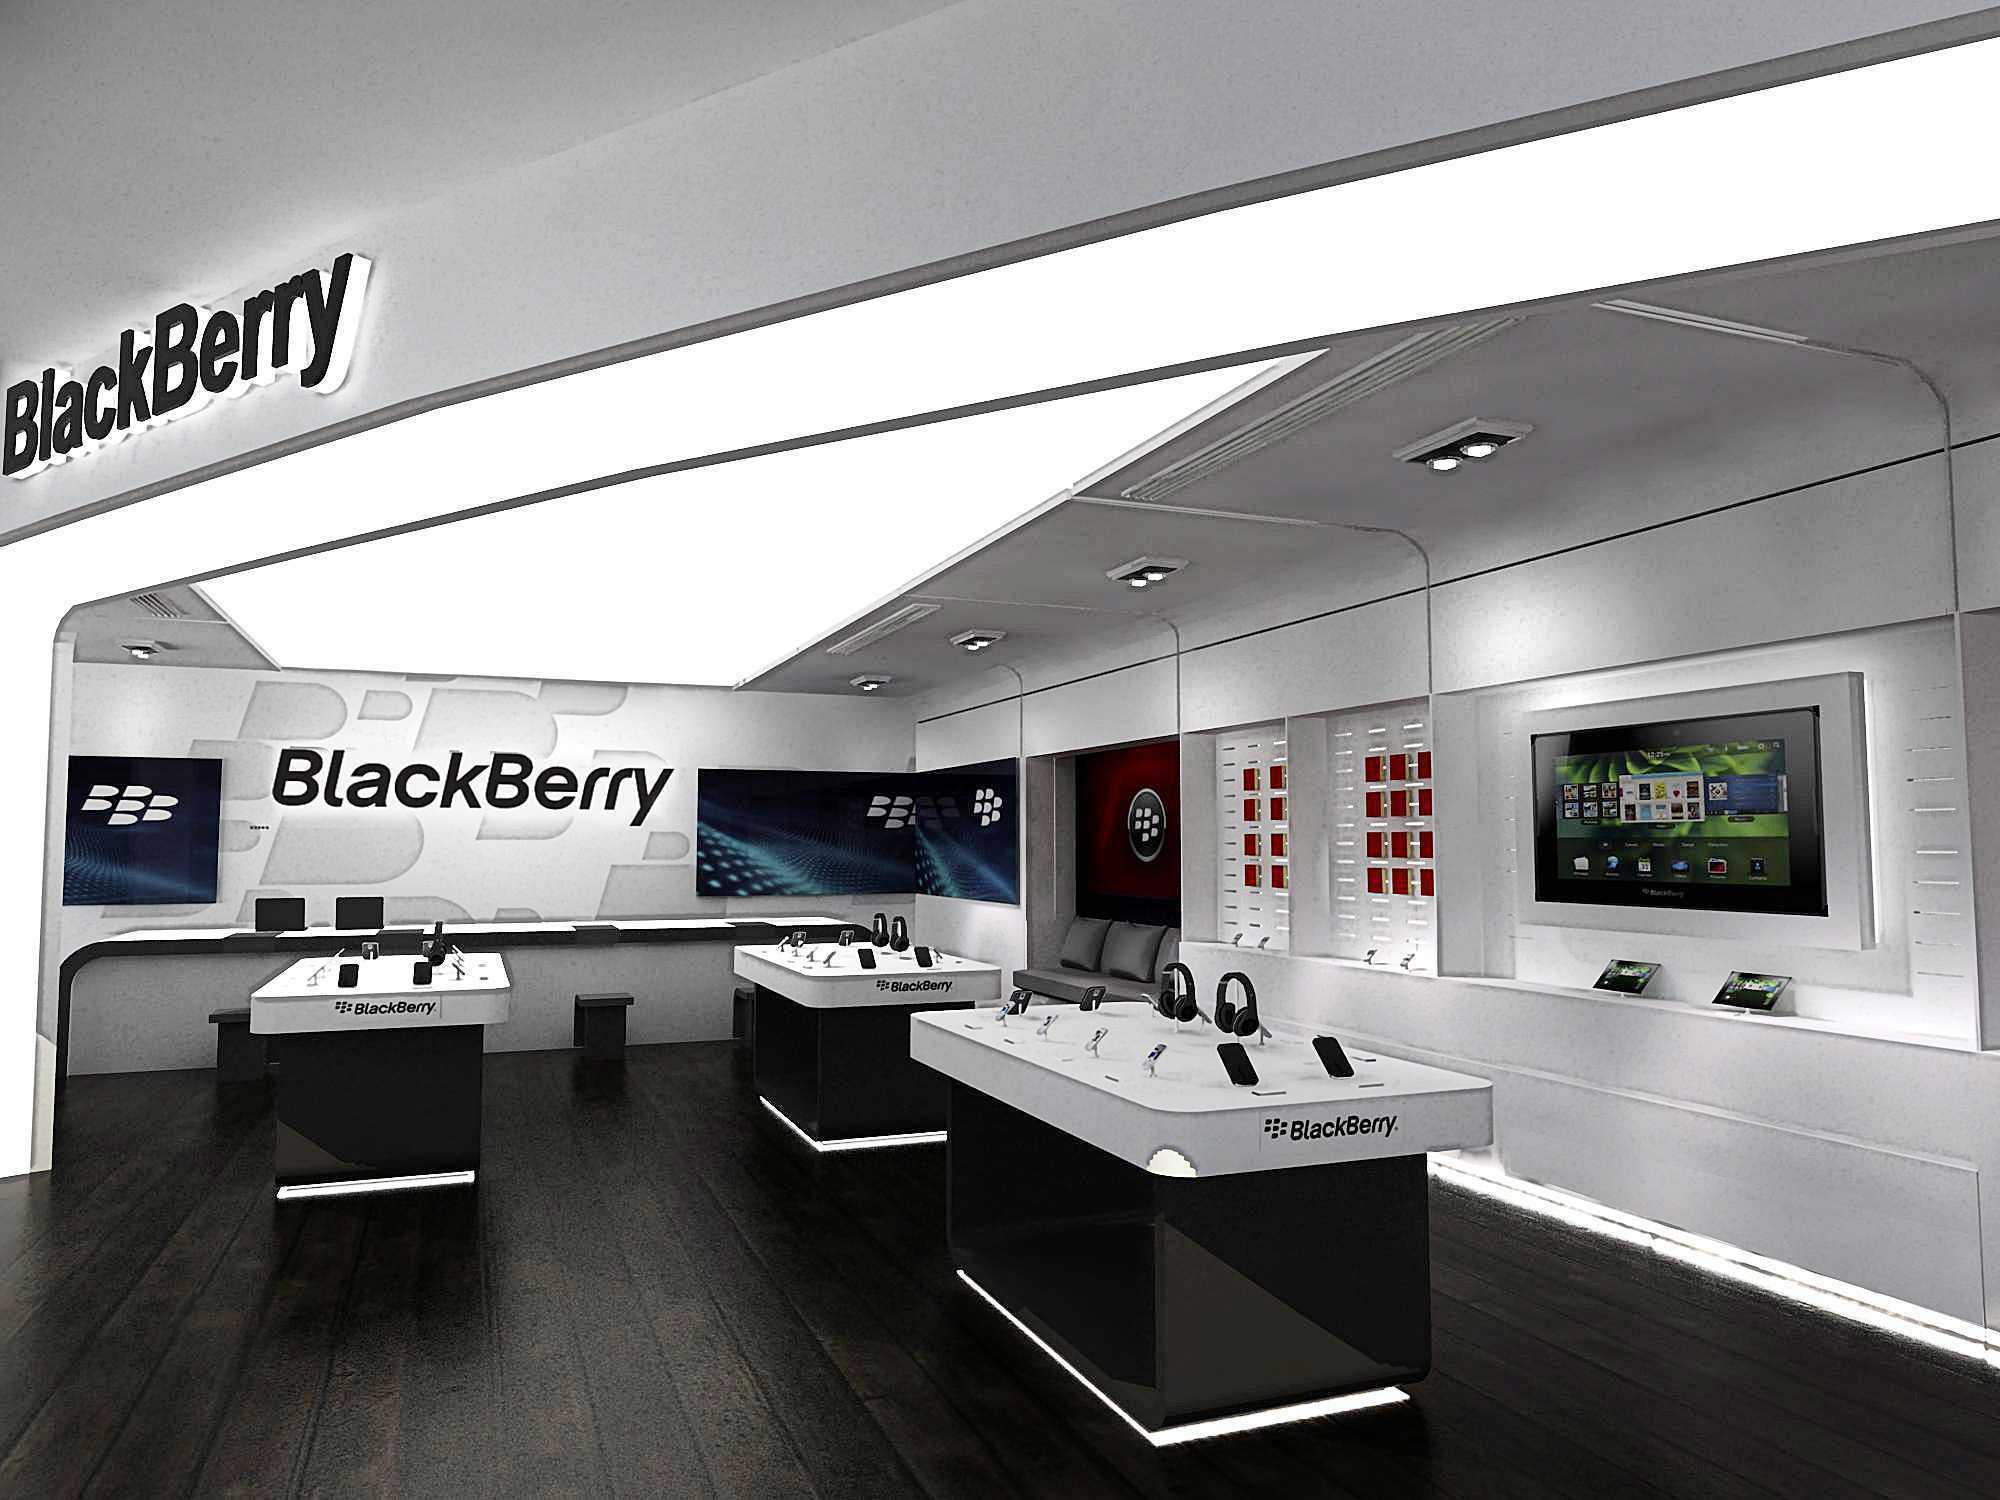 Astana Interior Blackberry Store Mkg Jakarta, Daerah Khusus Ibukota Jakarta, Indonesia Jakarta, Daerah Khusus Ibukota Jakarta, Indonesia Astana-Interior-Blackberry-Store-Mkg  58033